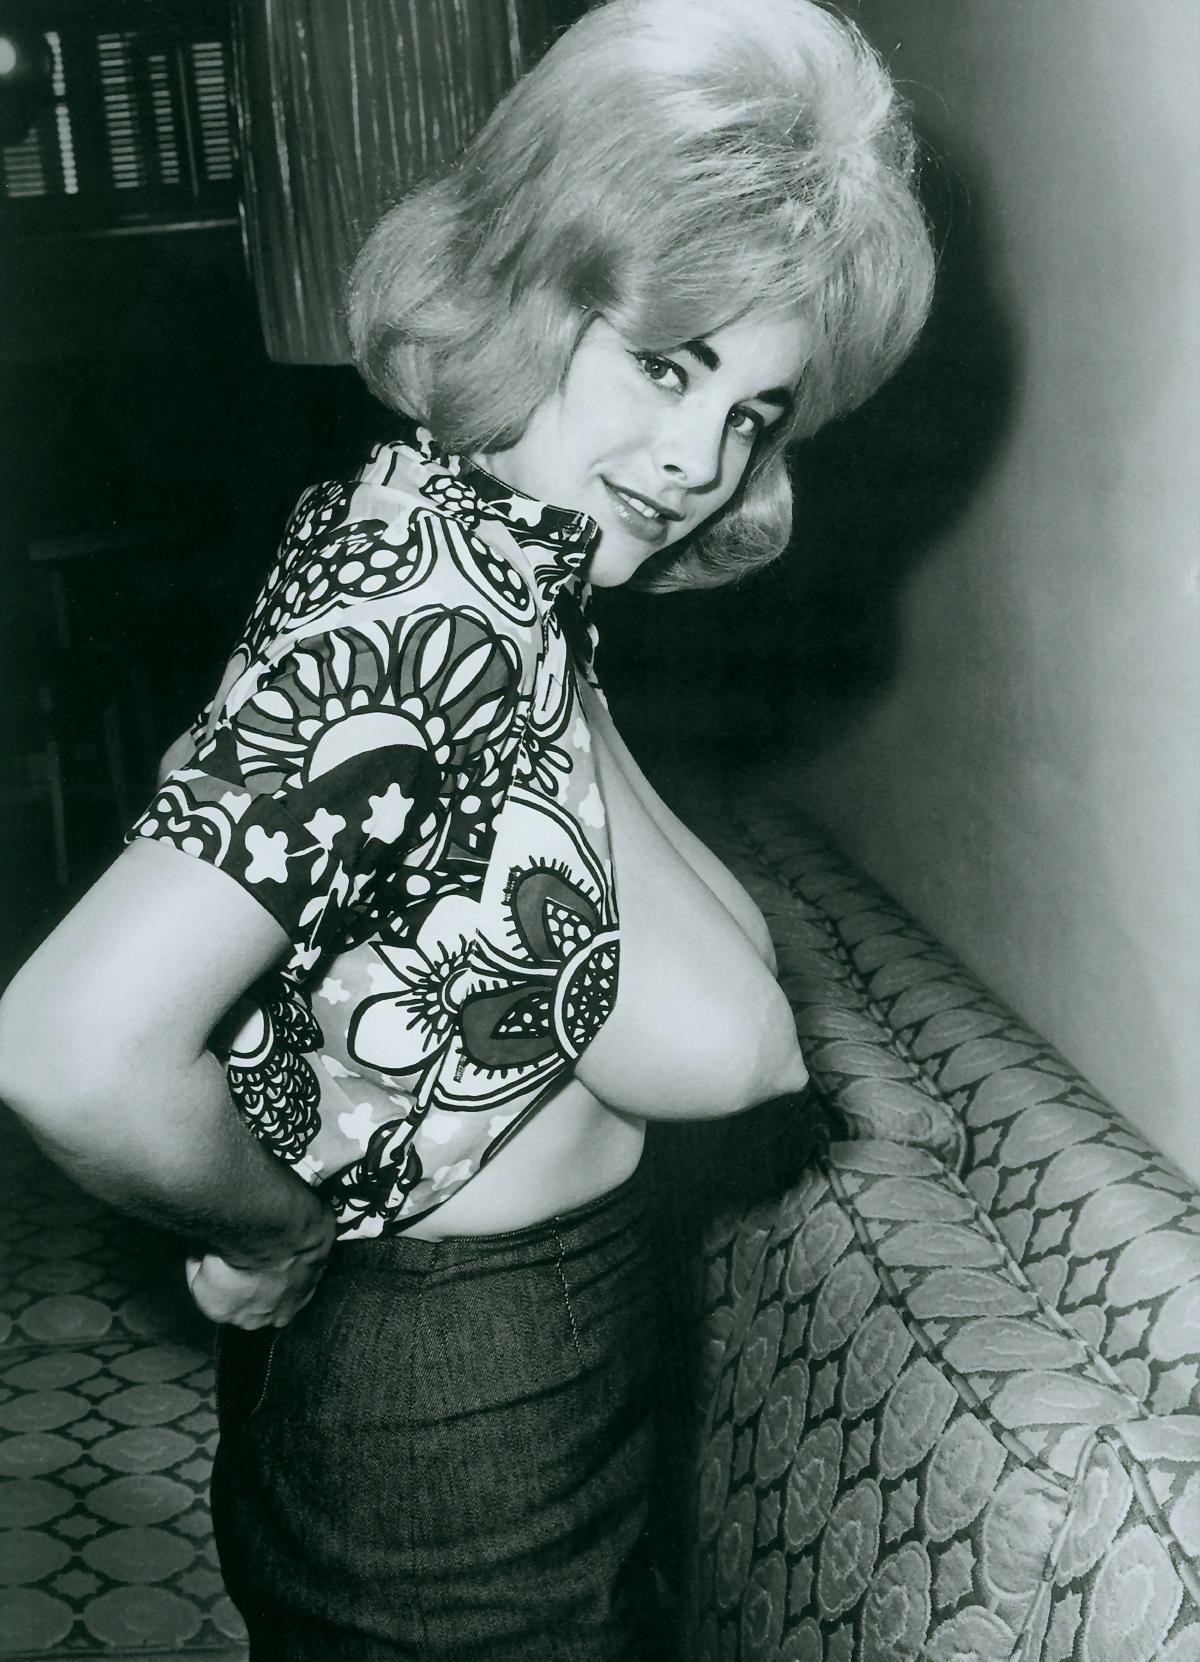 Lisa de leeuw hollywood starmovie - 3 2